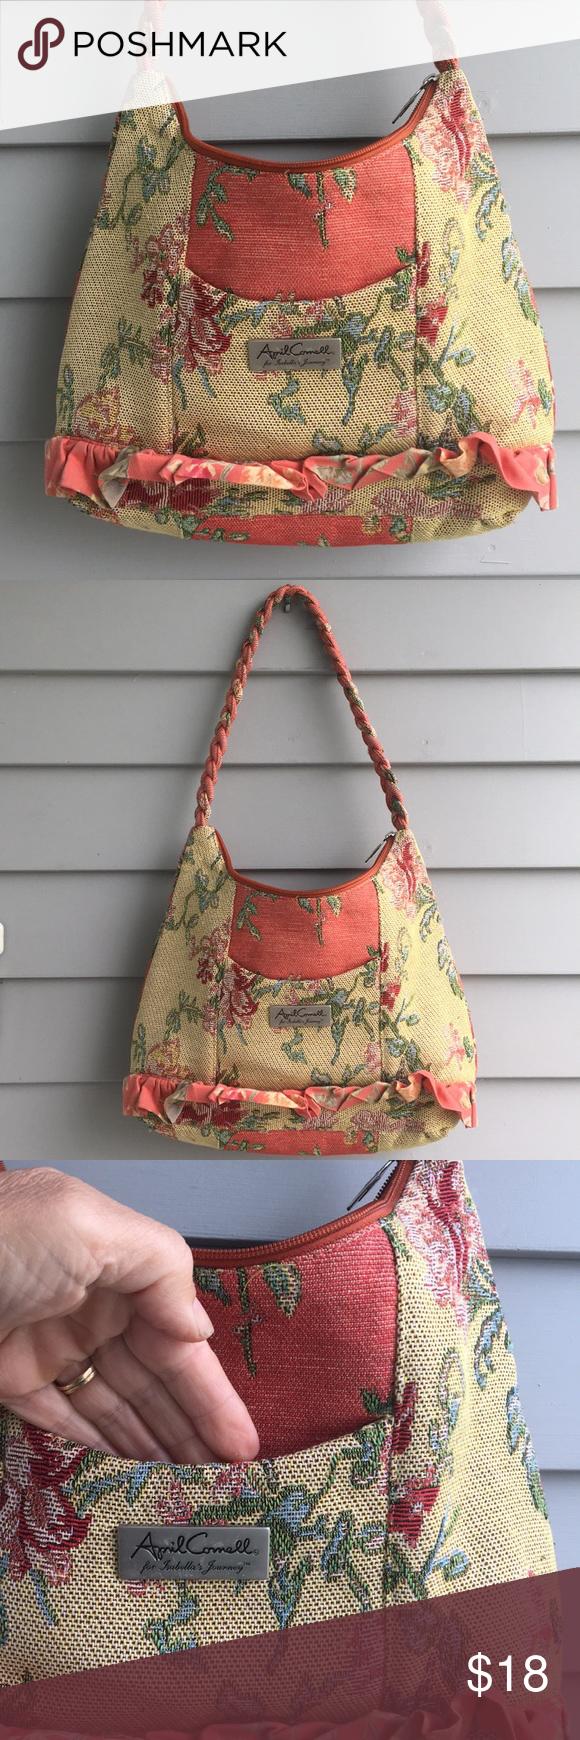 067215881a April Cornell for Isabellas journey Milner bag Lovely soft fabric ...